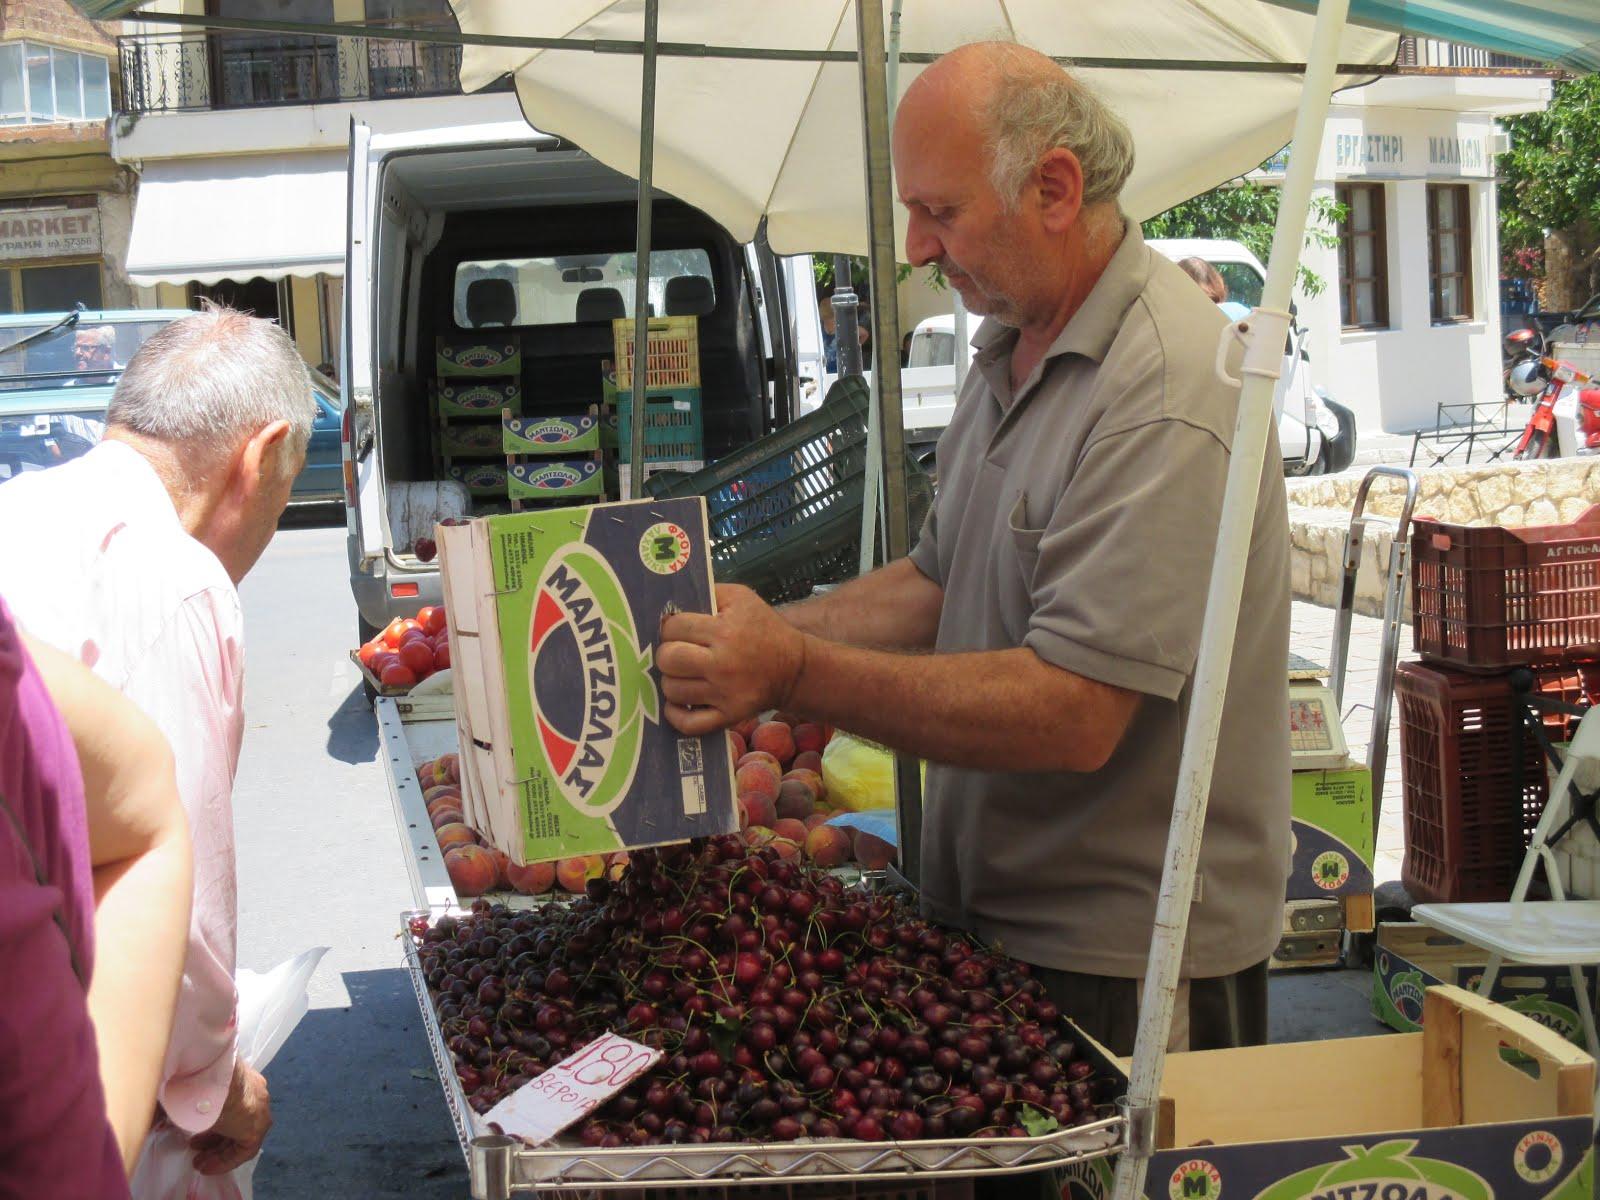 Man Selling Cherries at Farmers' Market, Chania, Crete, June 2015